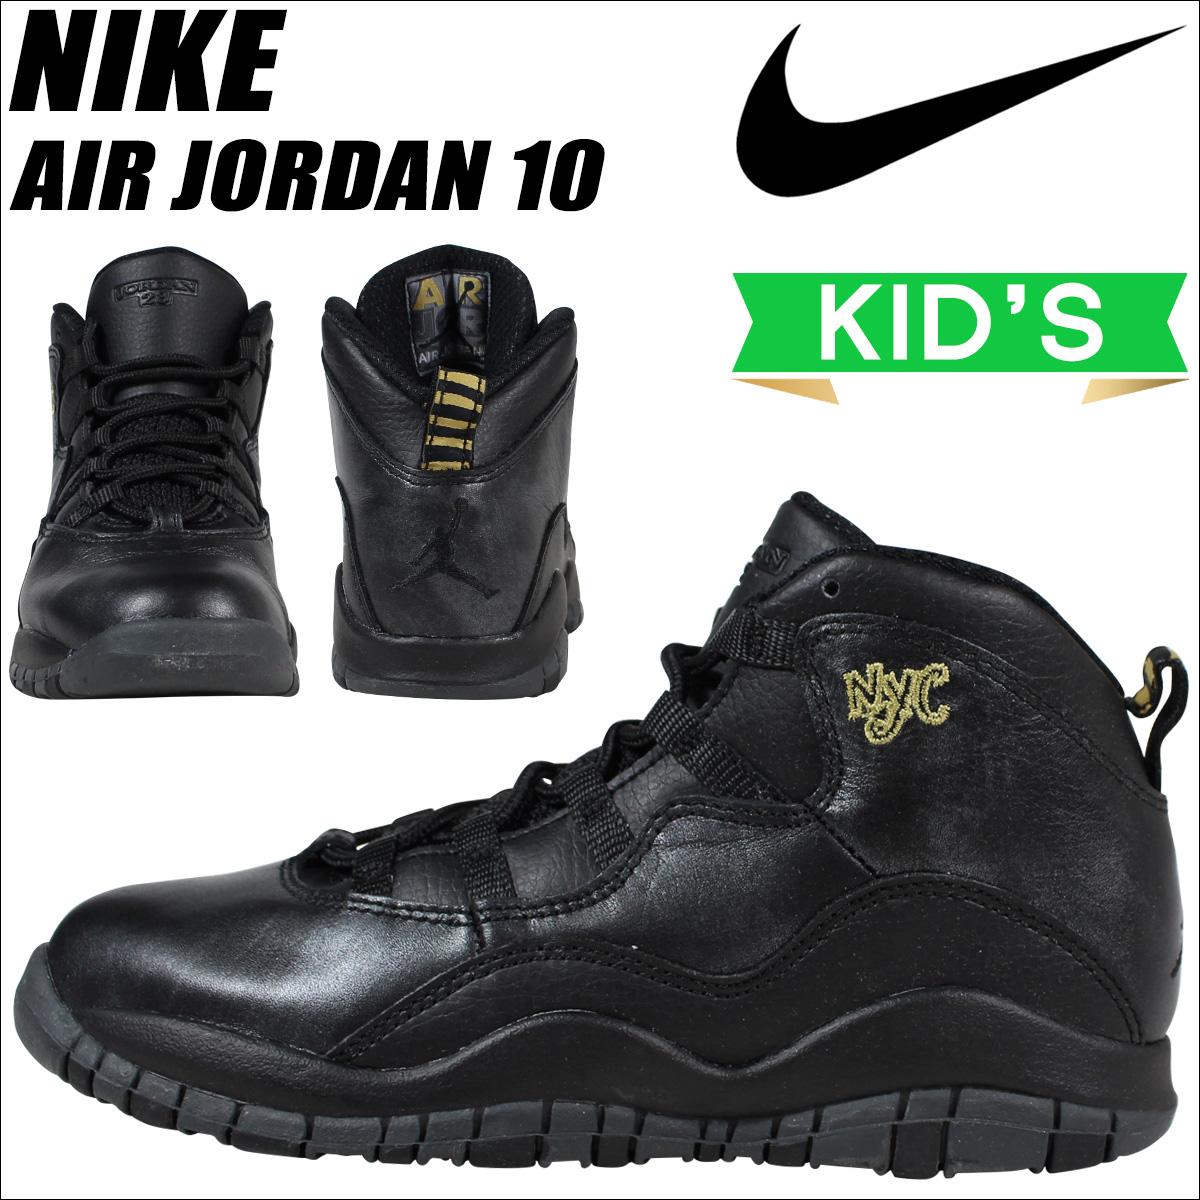 ... nike nike air jordan sneakers kids jordan retro 10 nyc ps jordan retro  ... 3547978f0